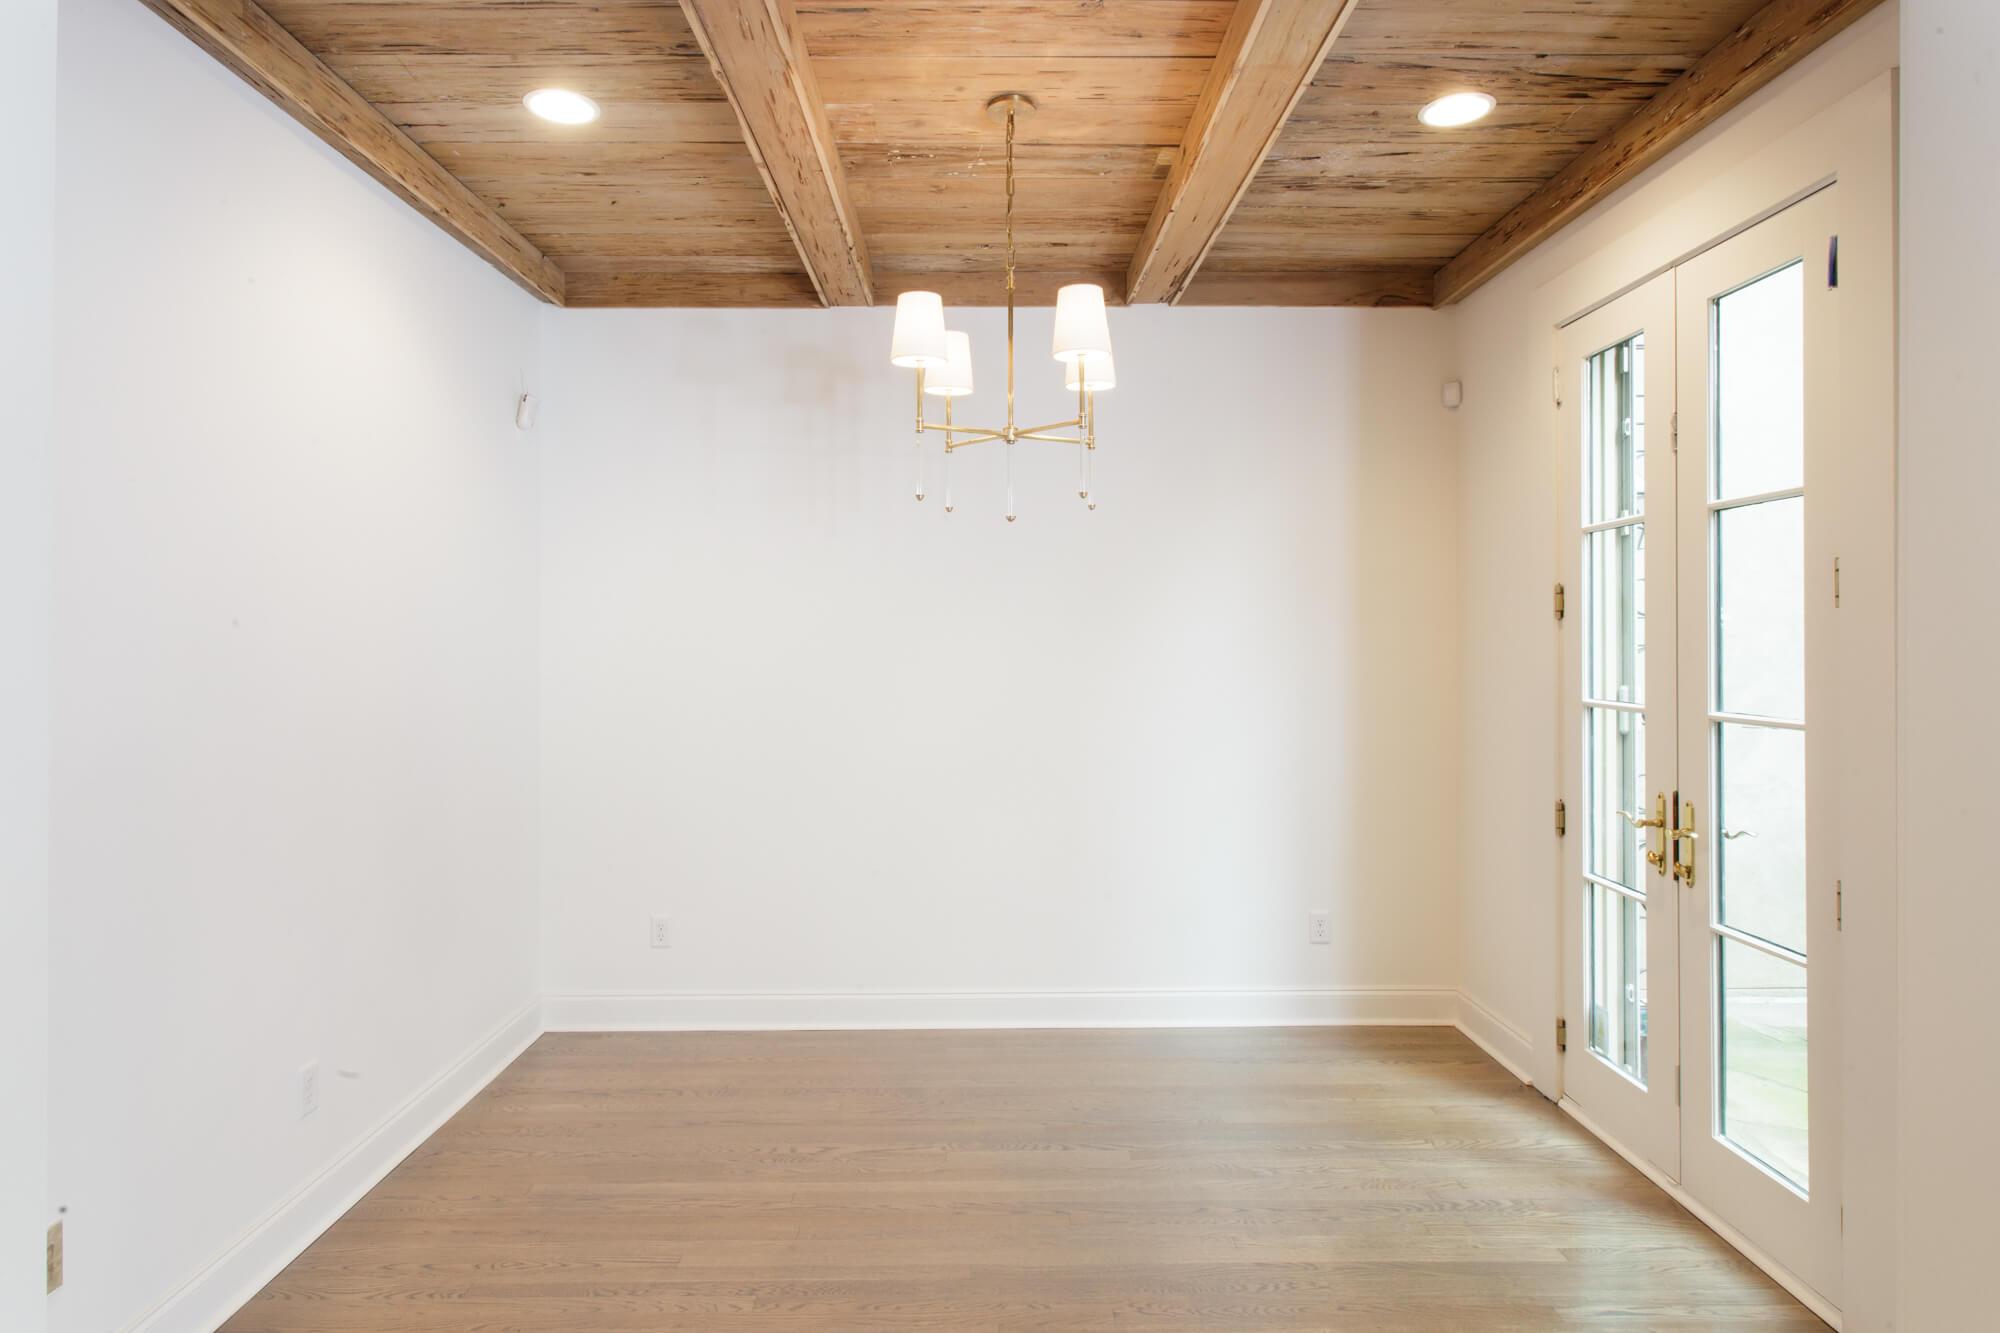 chandelier-development-tennessee-custom-home-builder-22.jpg